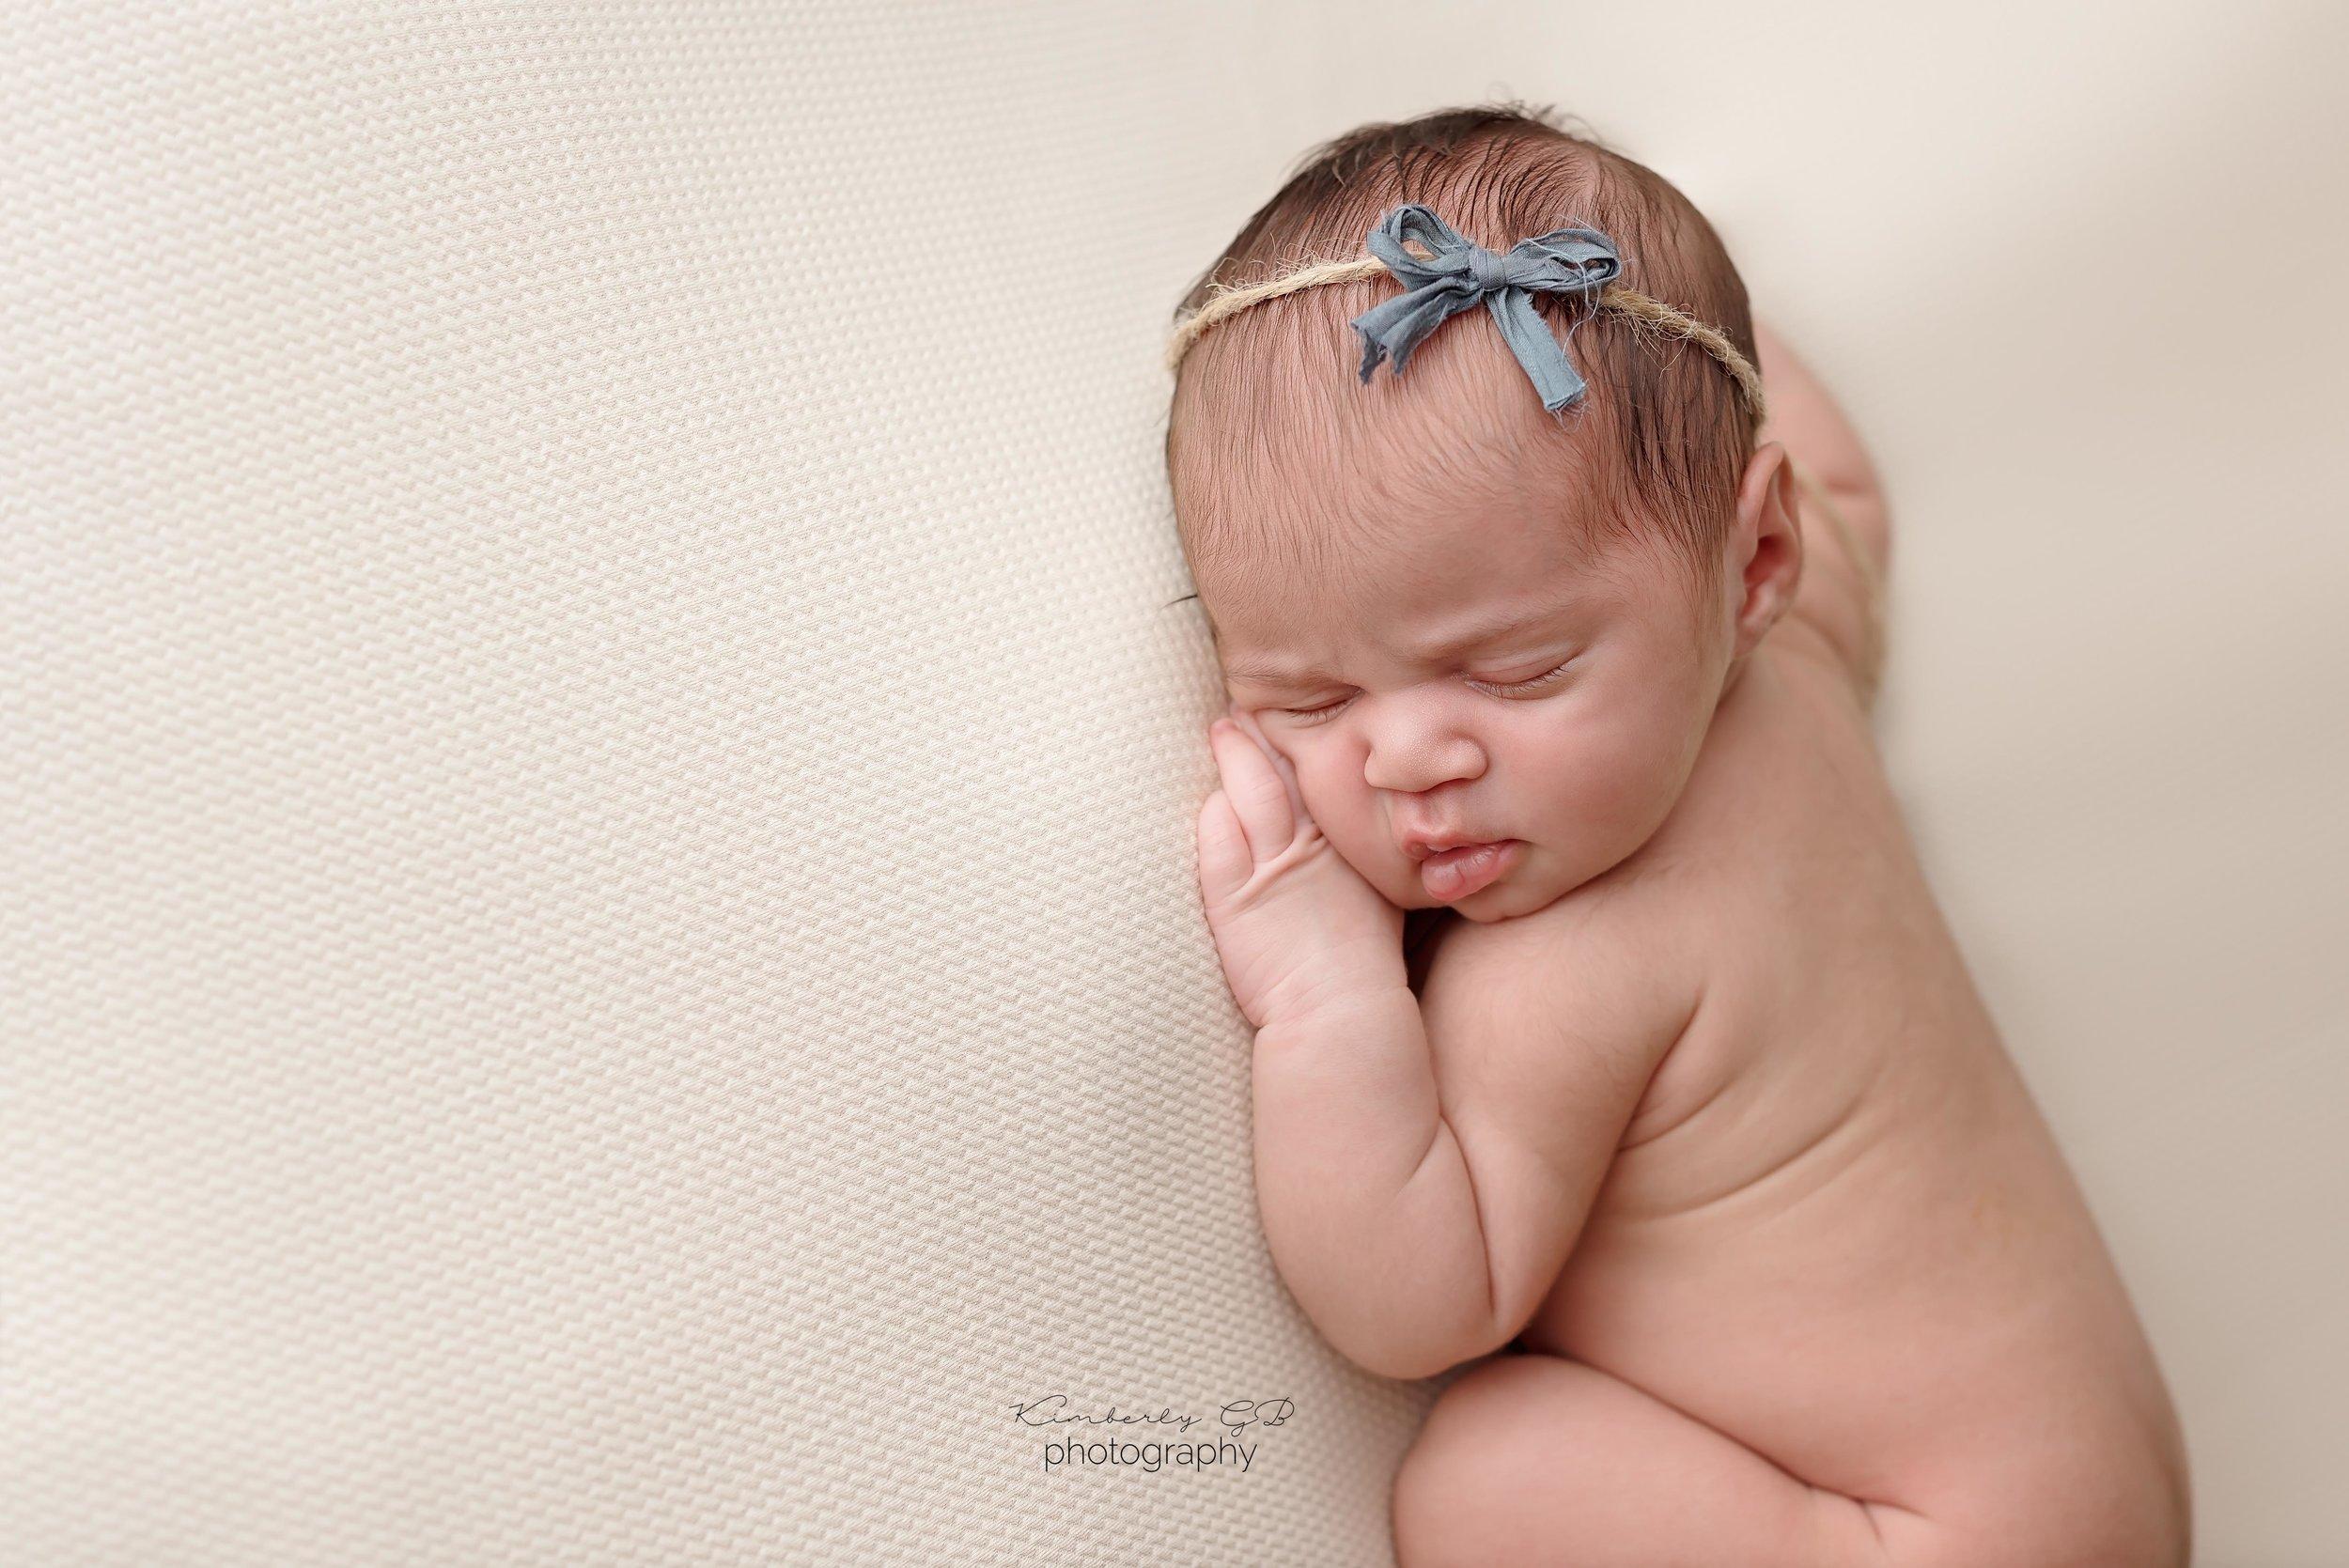 fotografia-de-recien-nacidos-bebes-newborn-en-puerto-rico-kimberly-gb-photography-fotografa-174.jpg